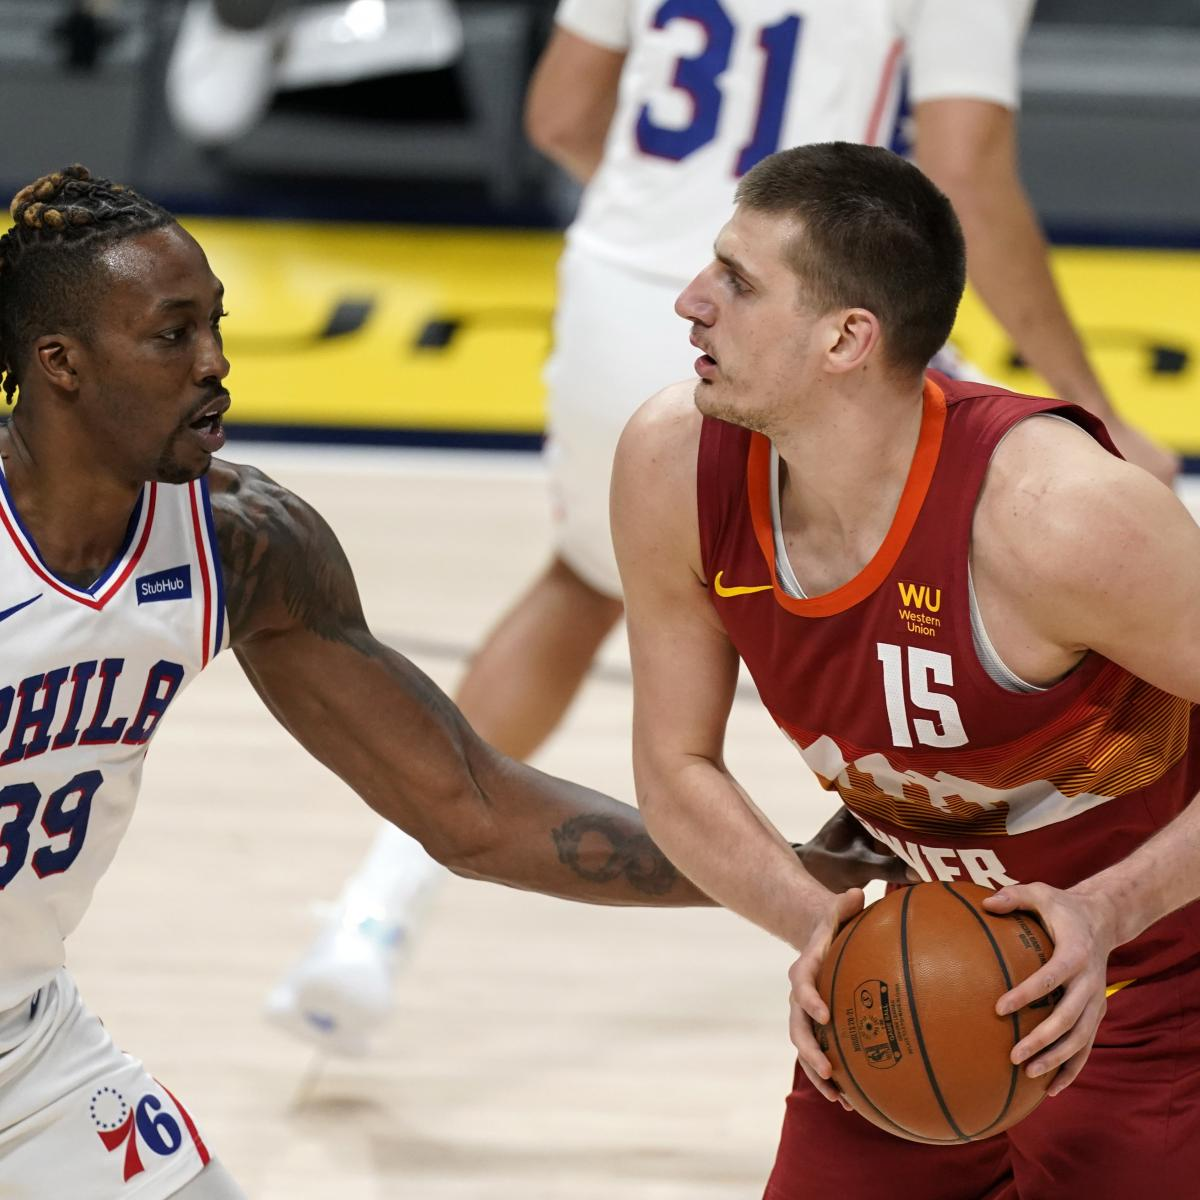 Nikola Jokic, Jamal Murray Lead Nuggets to Big Win vs. Ben Simmons, 76ers thumbnail